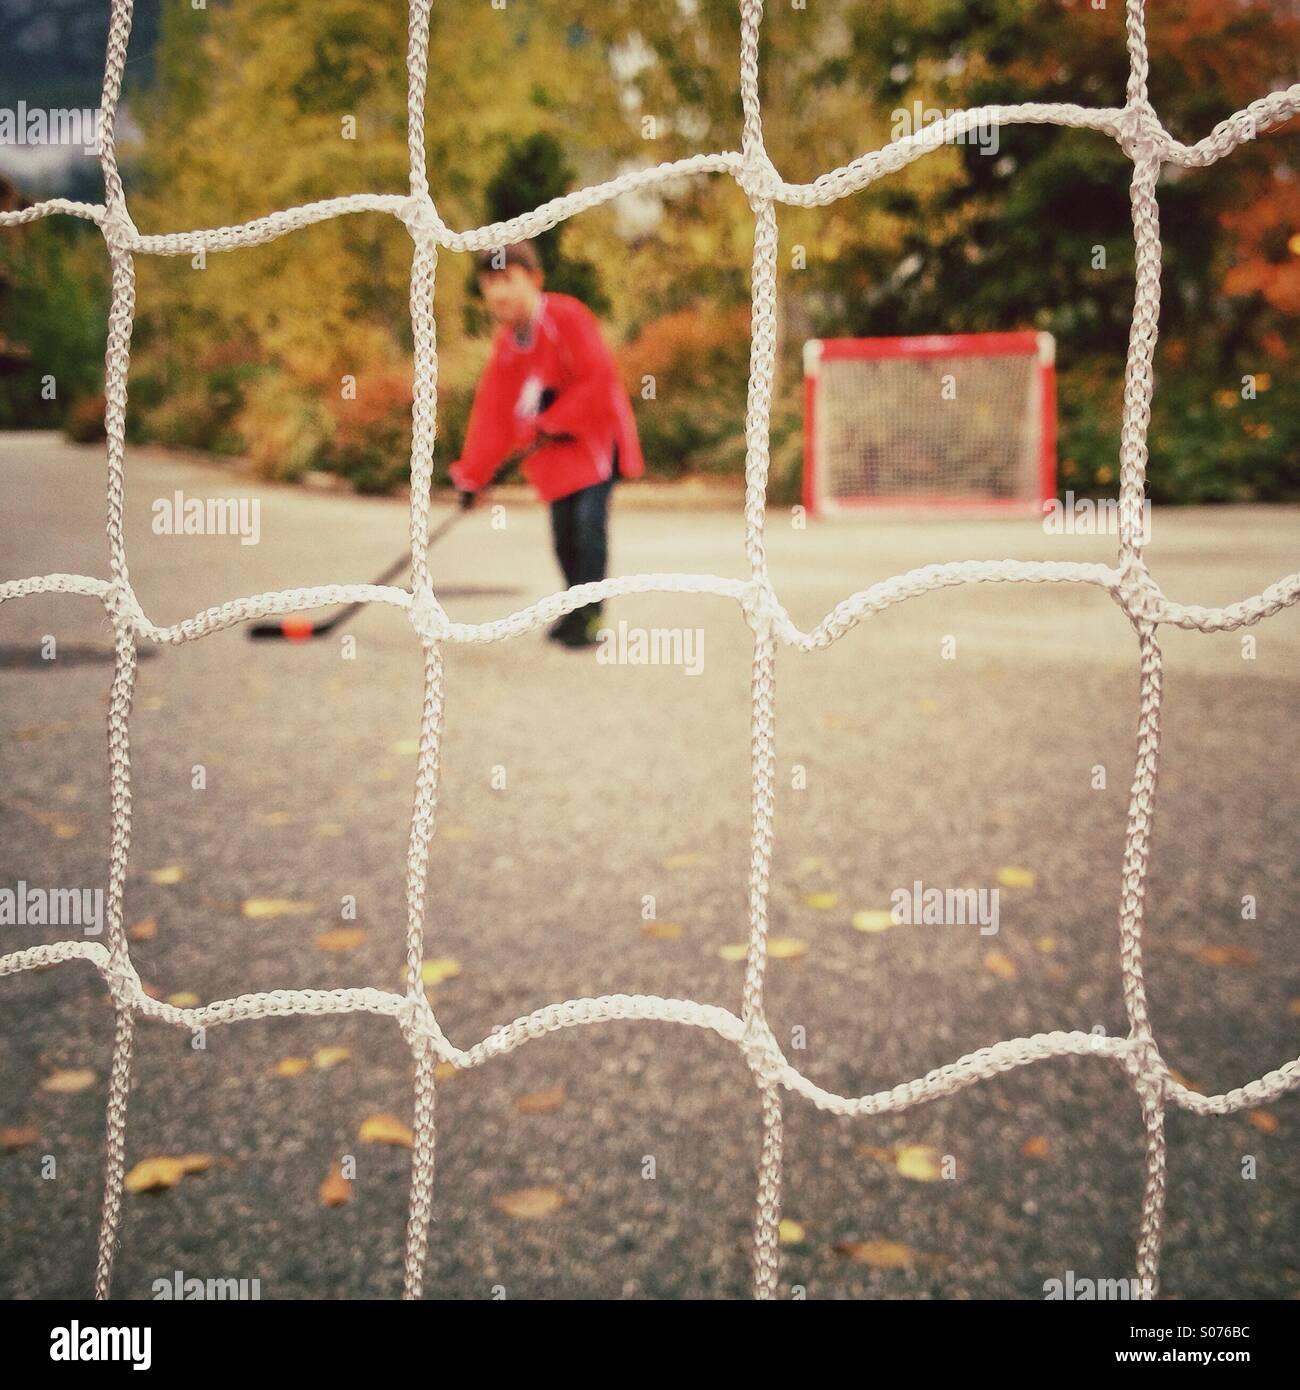 Giovane ragazzo giocando street hockey Immagini Stock